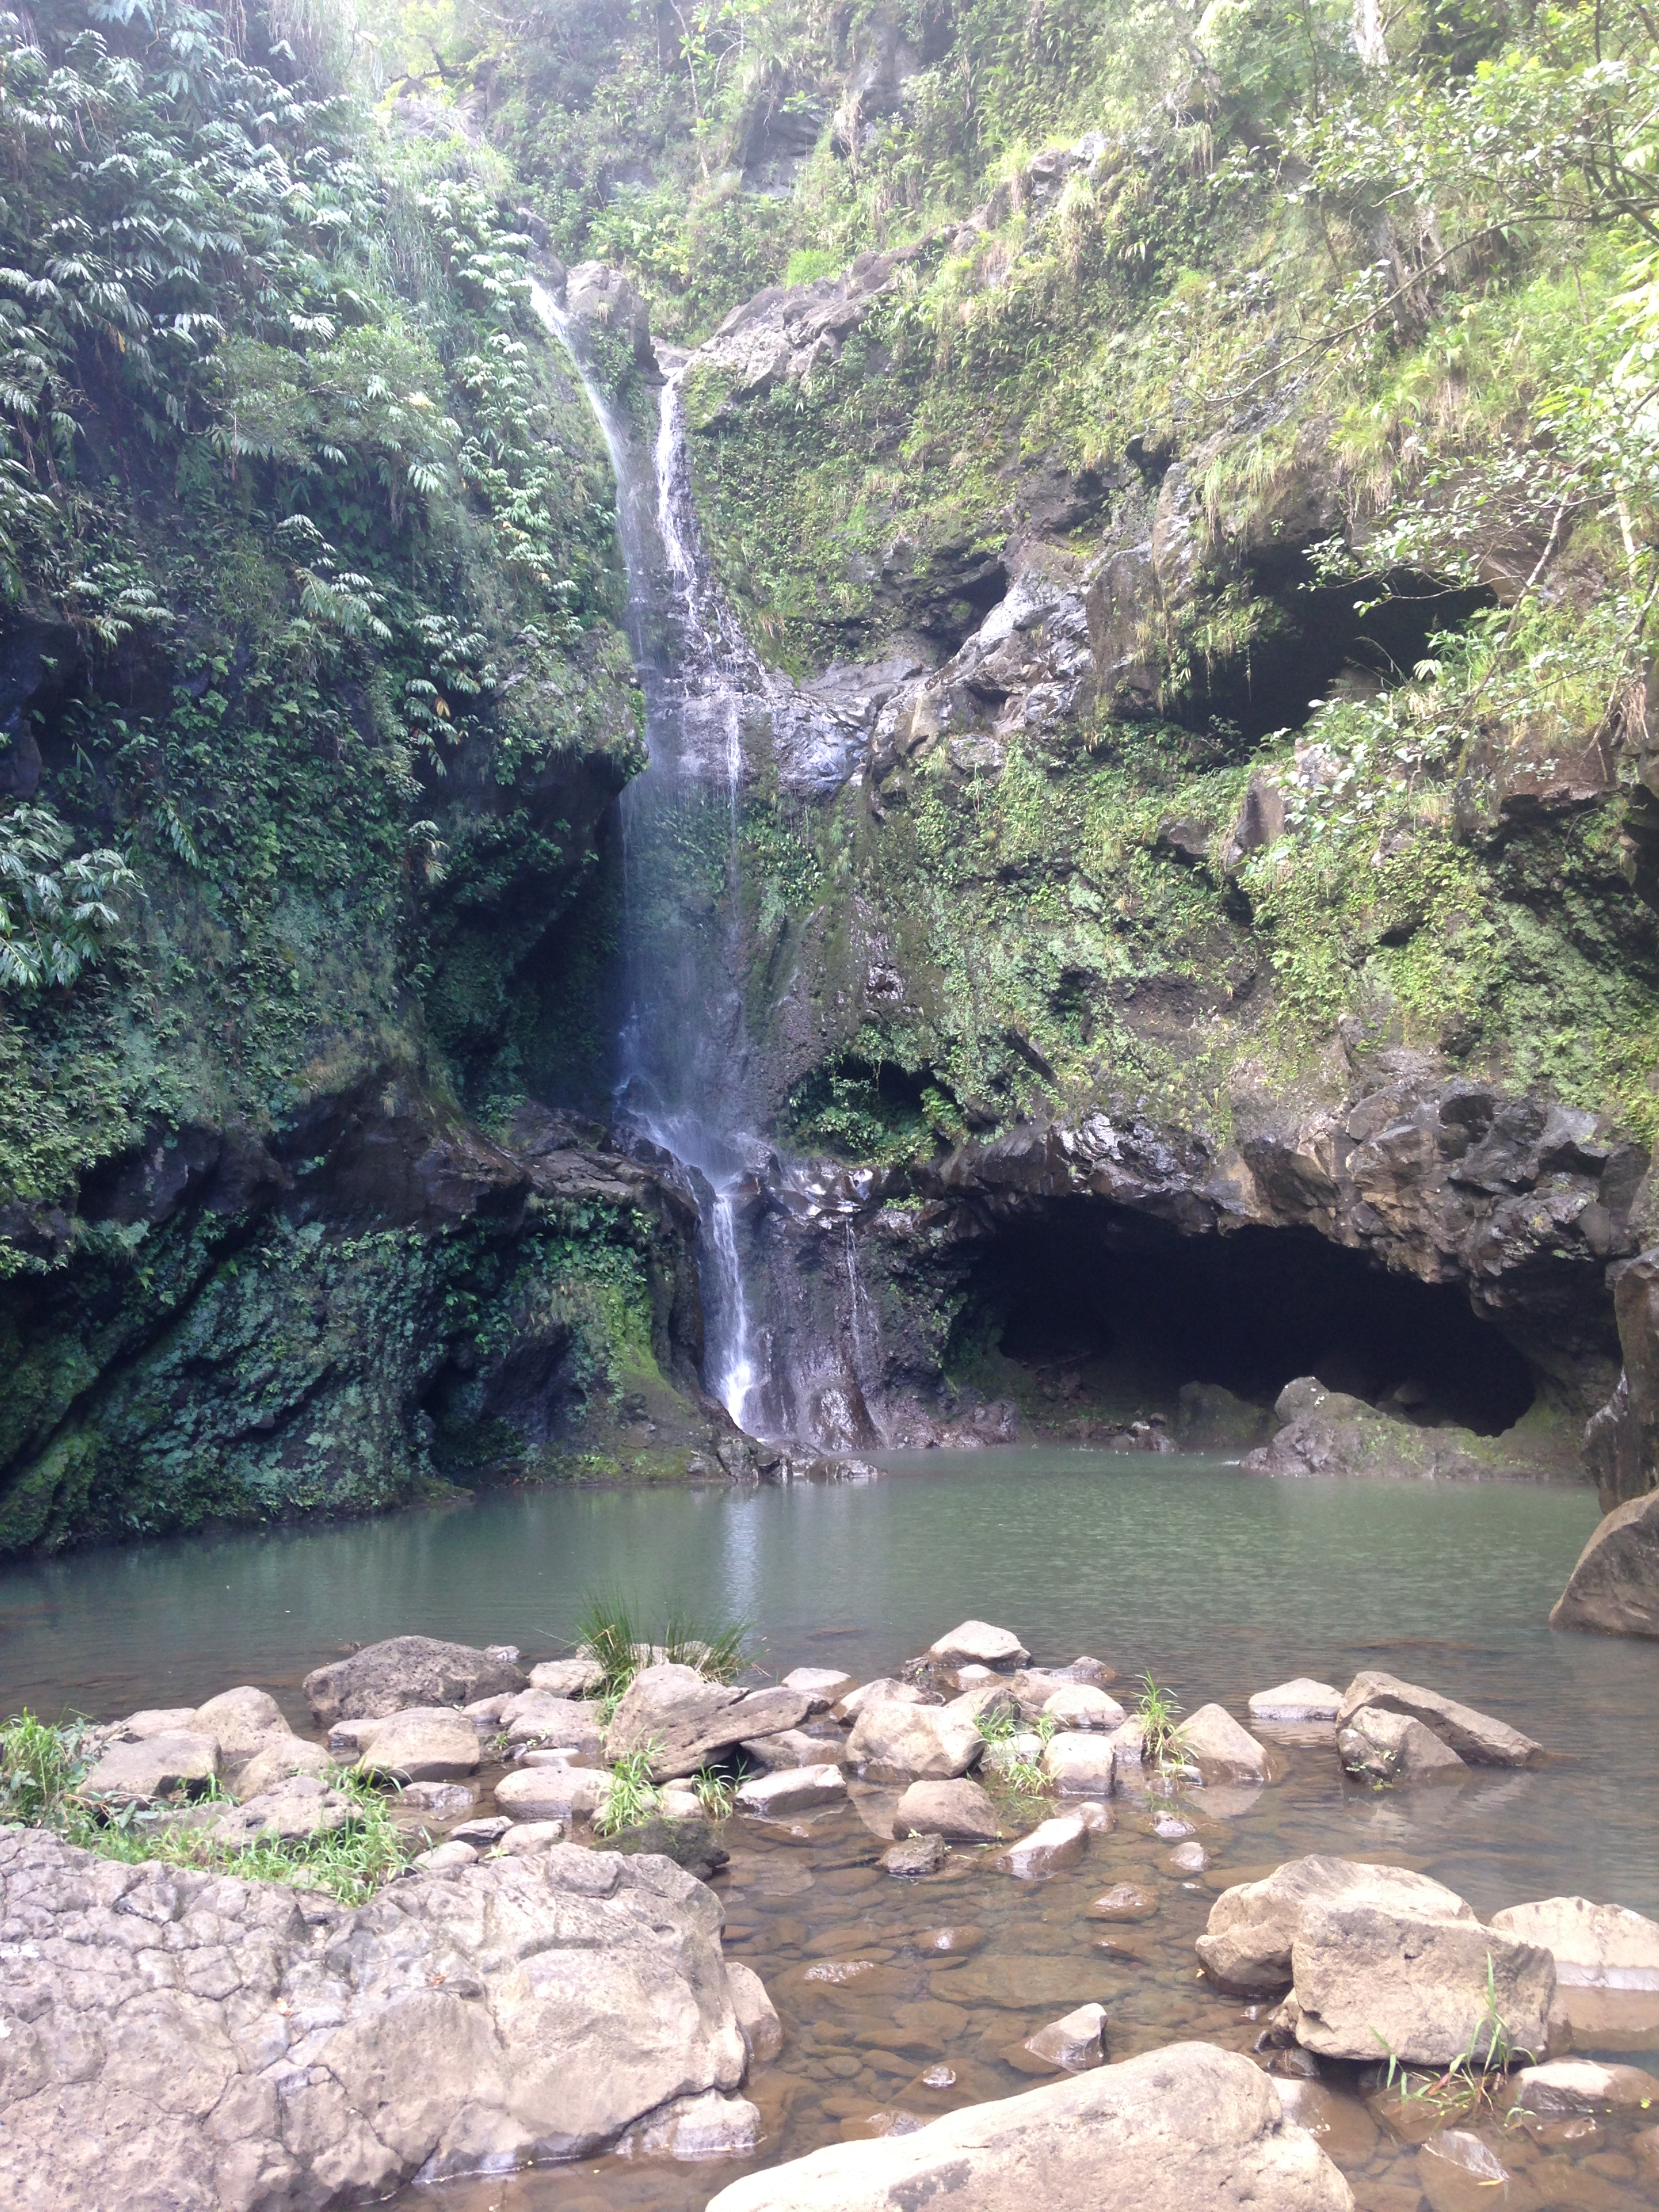 The Road To Hana Maui Hawaii Cobblesand Travel Blog